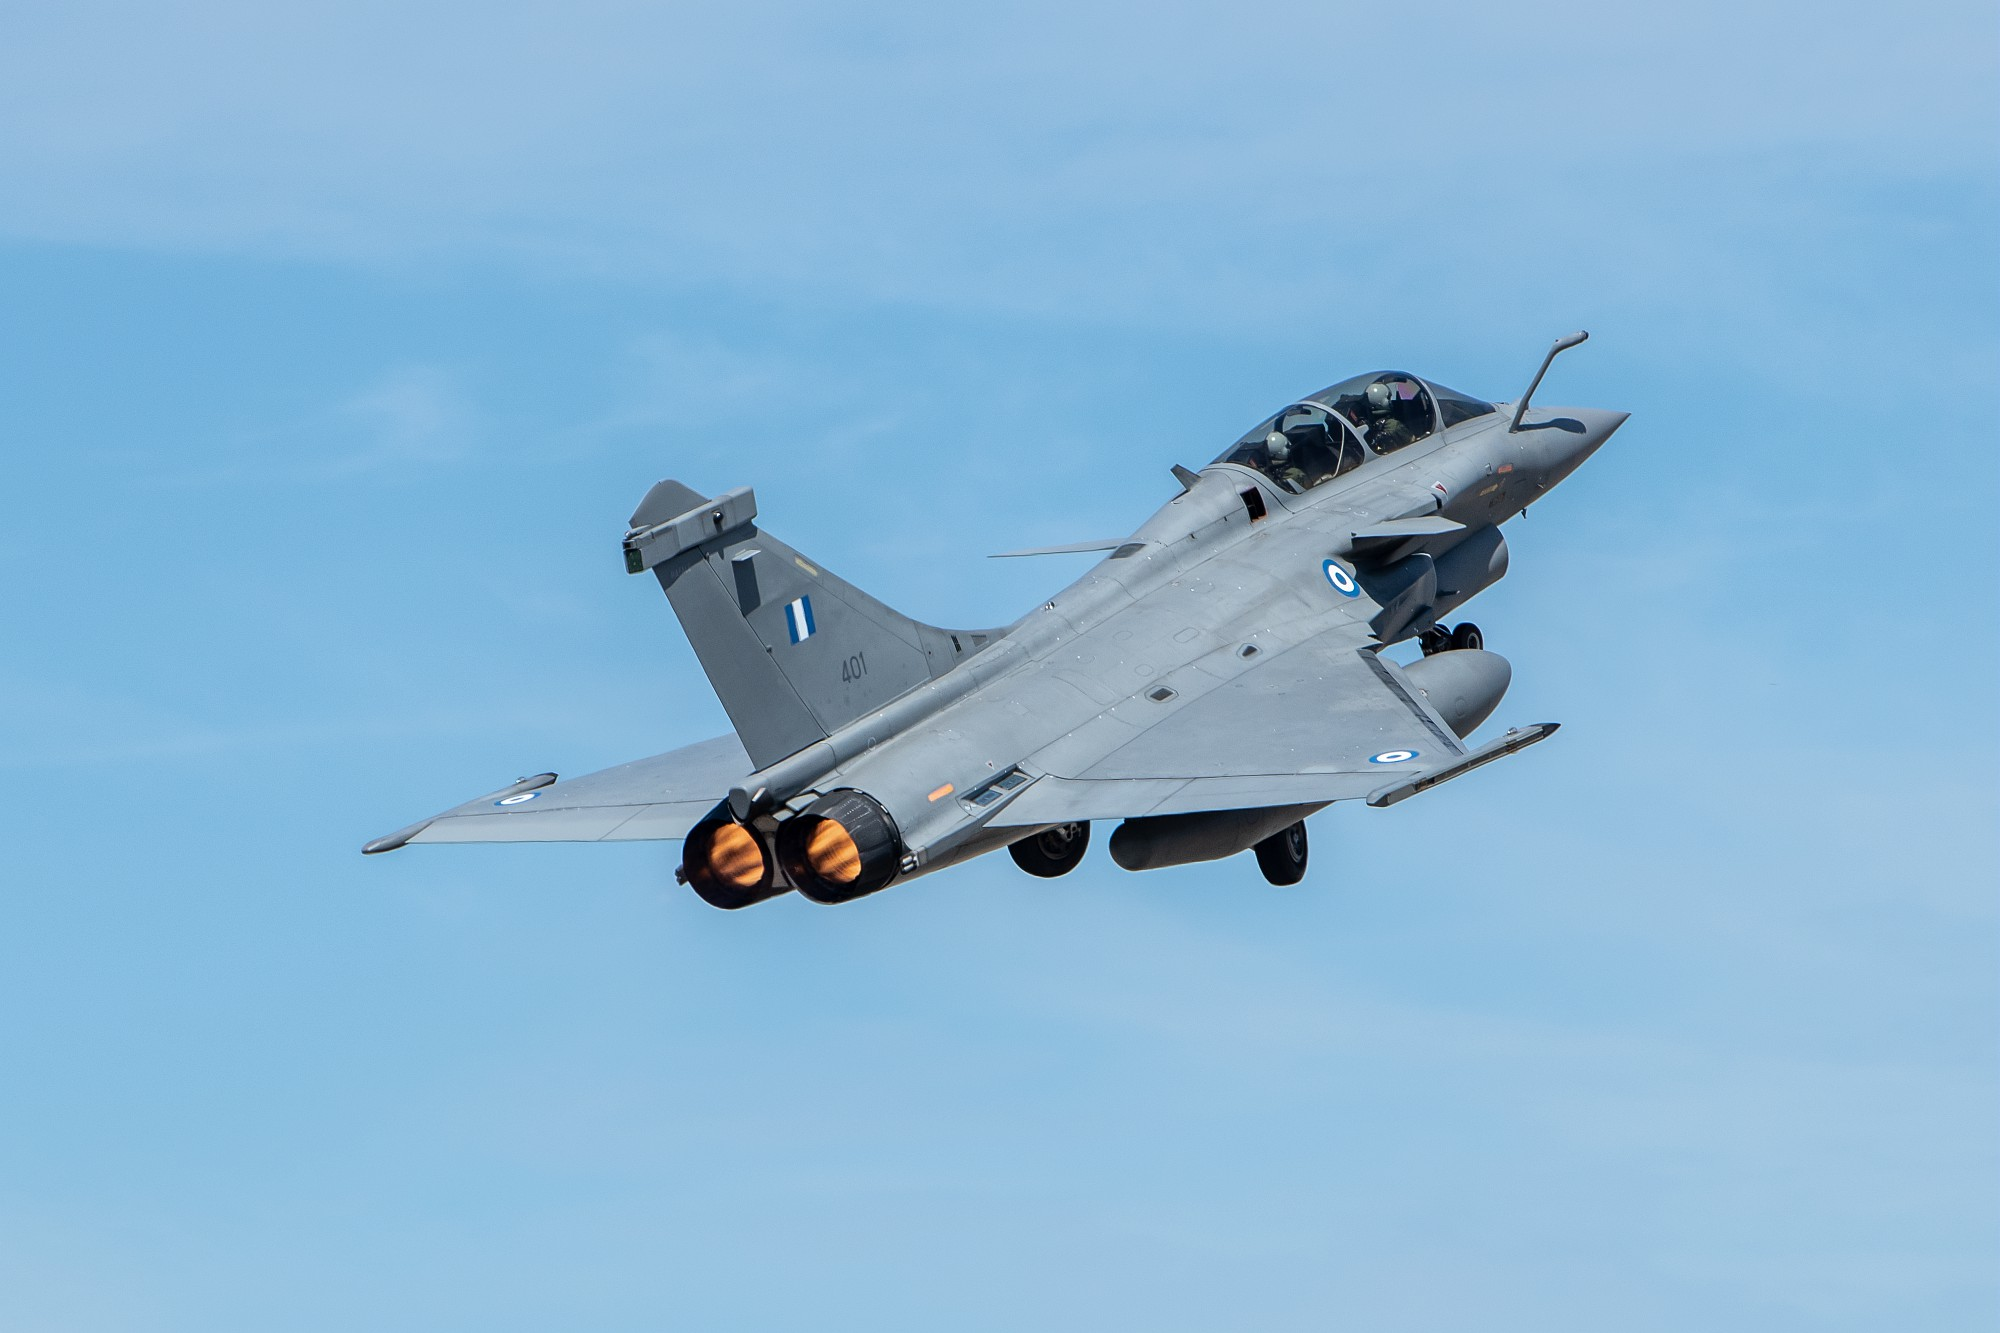 Rafale: Όταν τα γαλλικά μαχητικά πέτυχαν «8-0» εικονικές καταρρίψεις σε τουρκικά F-16